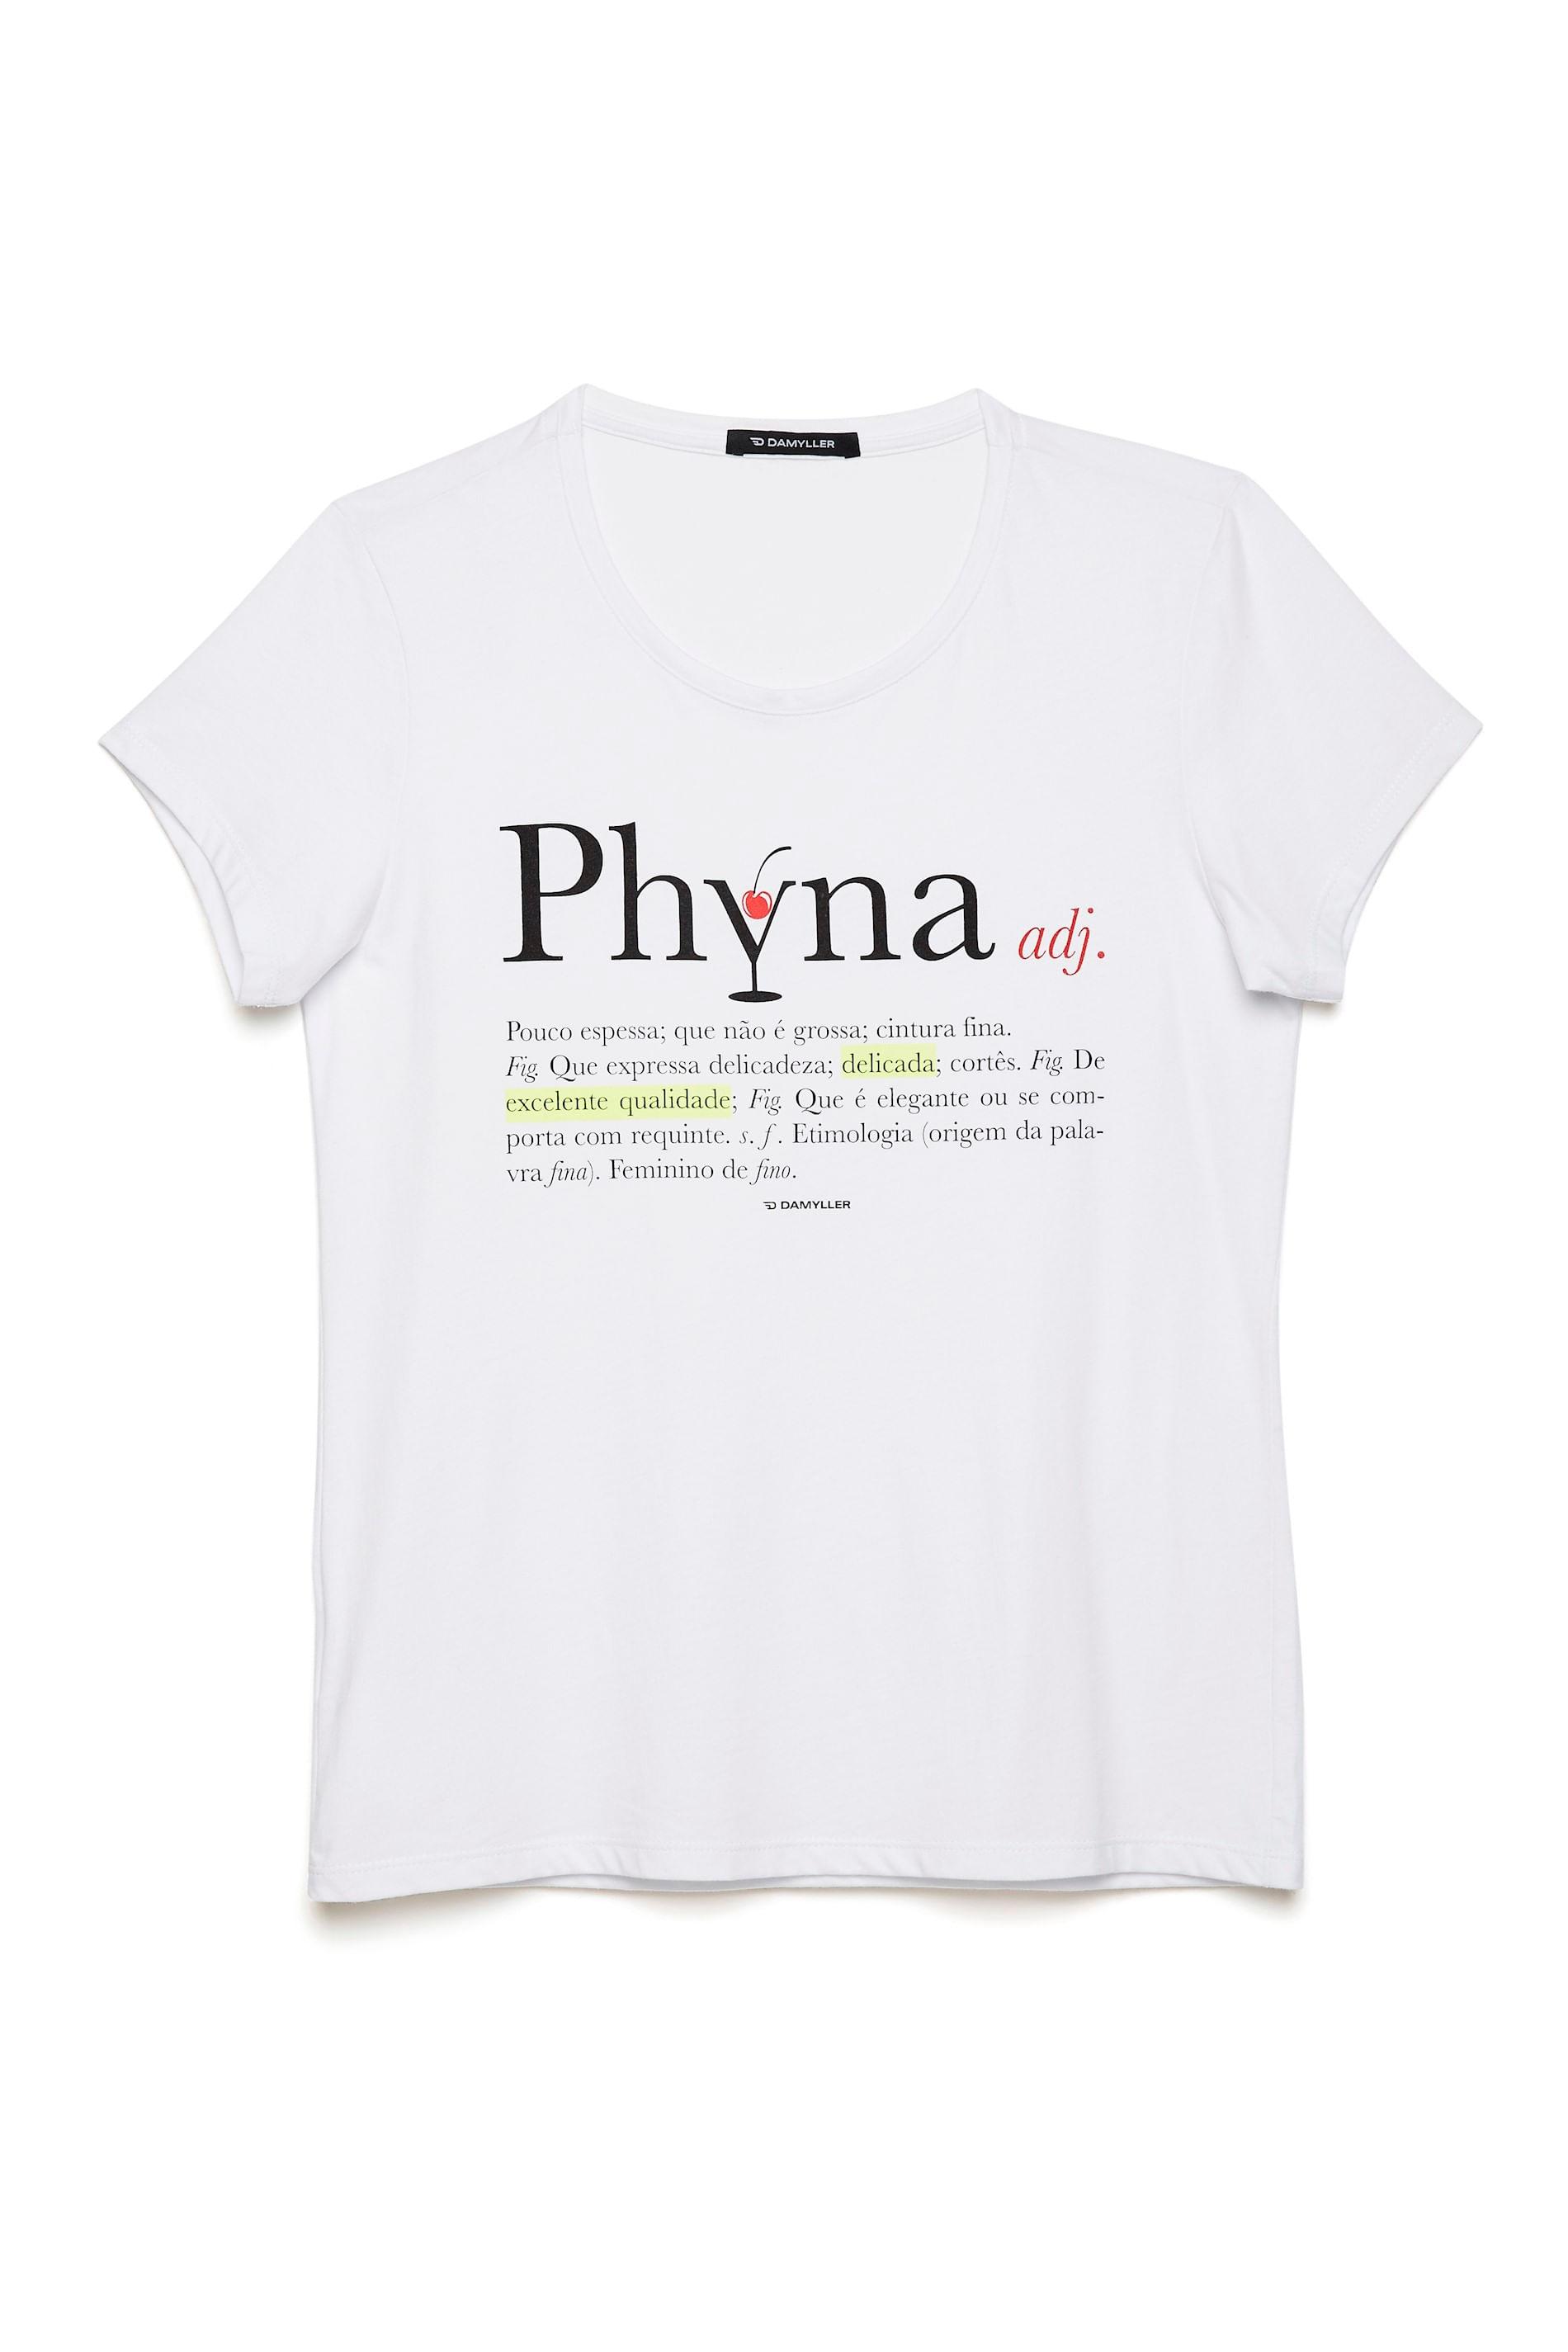 c4b7d5a8f Camiseta Estampa Phyna Feminina - Damyller